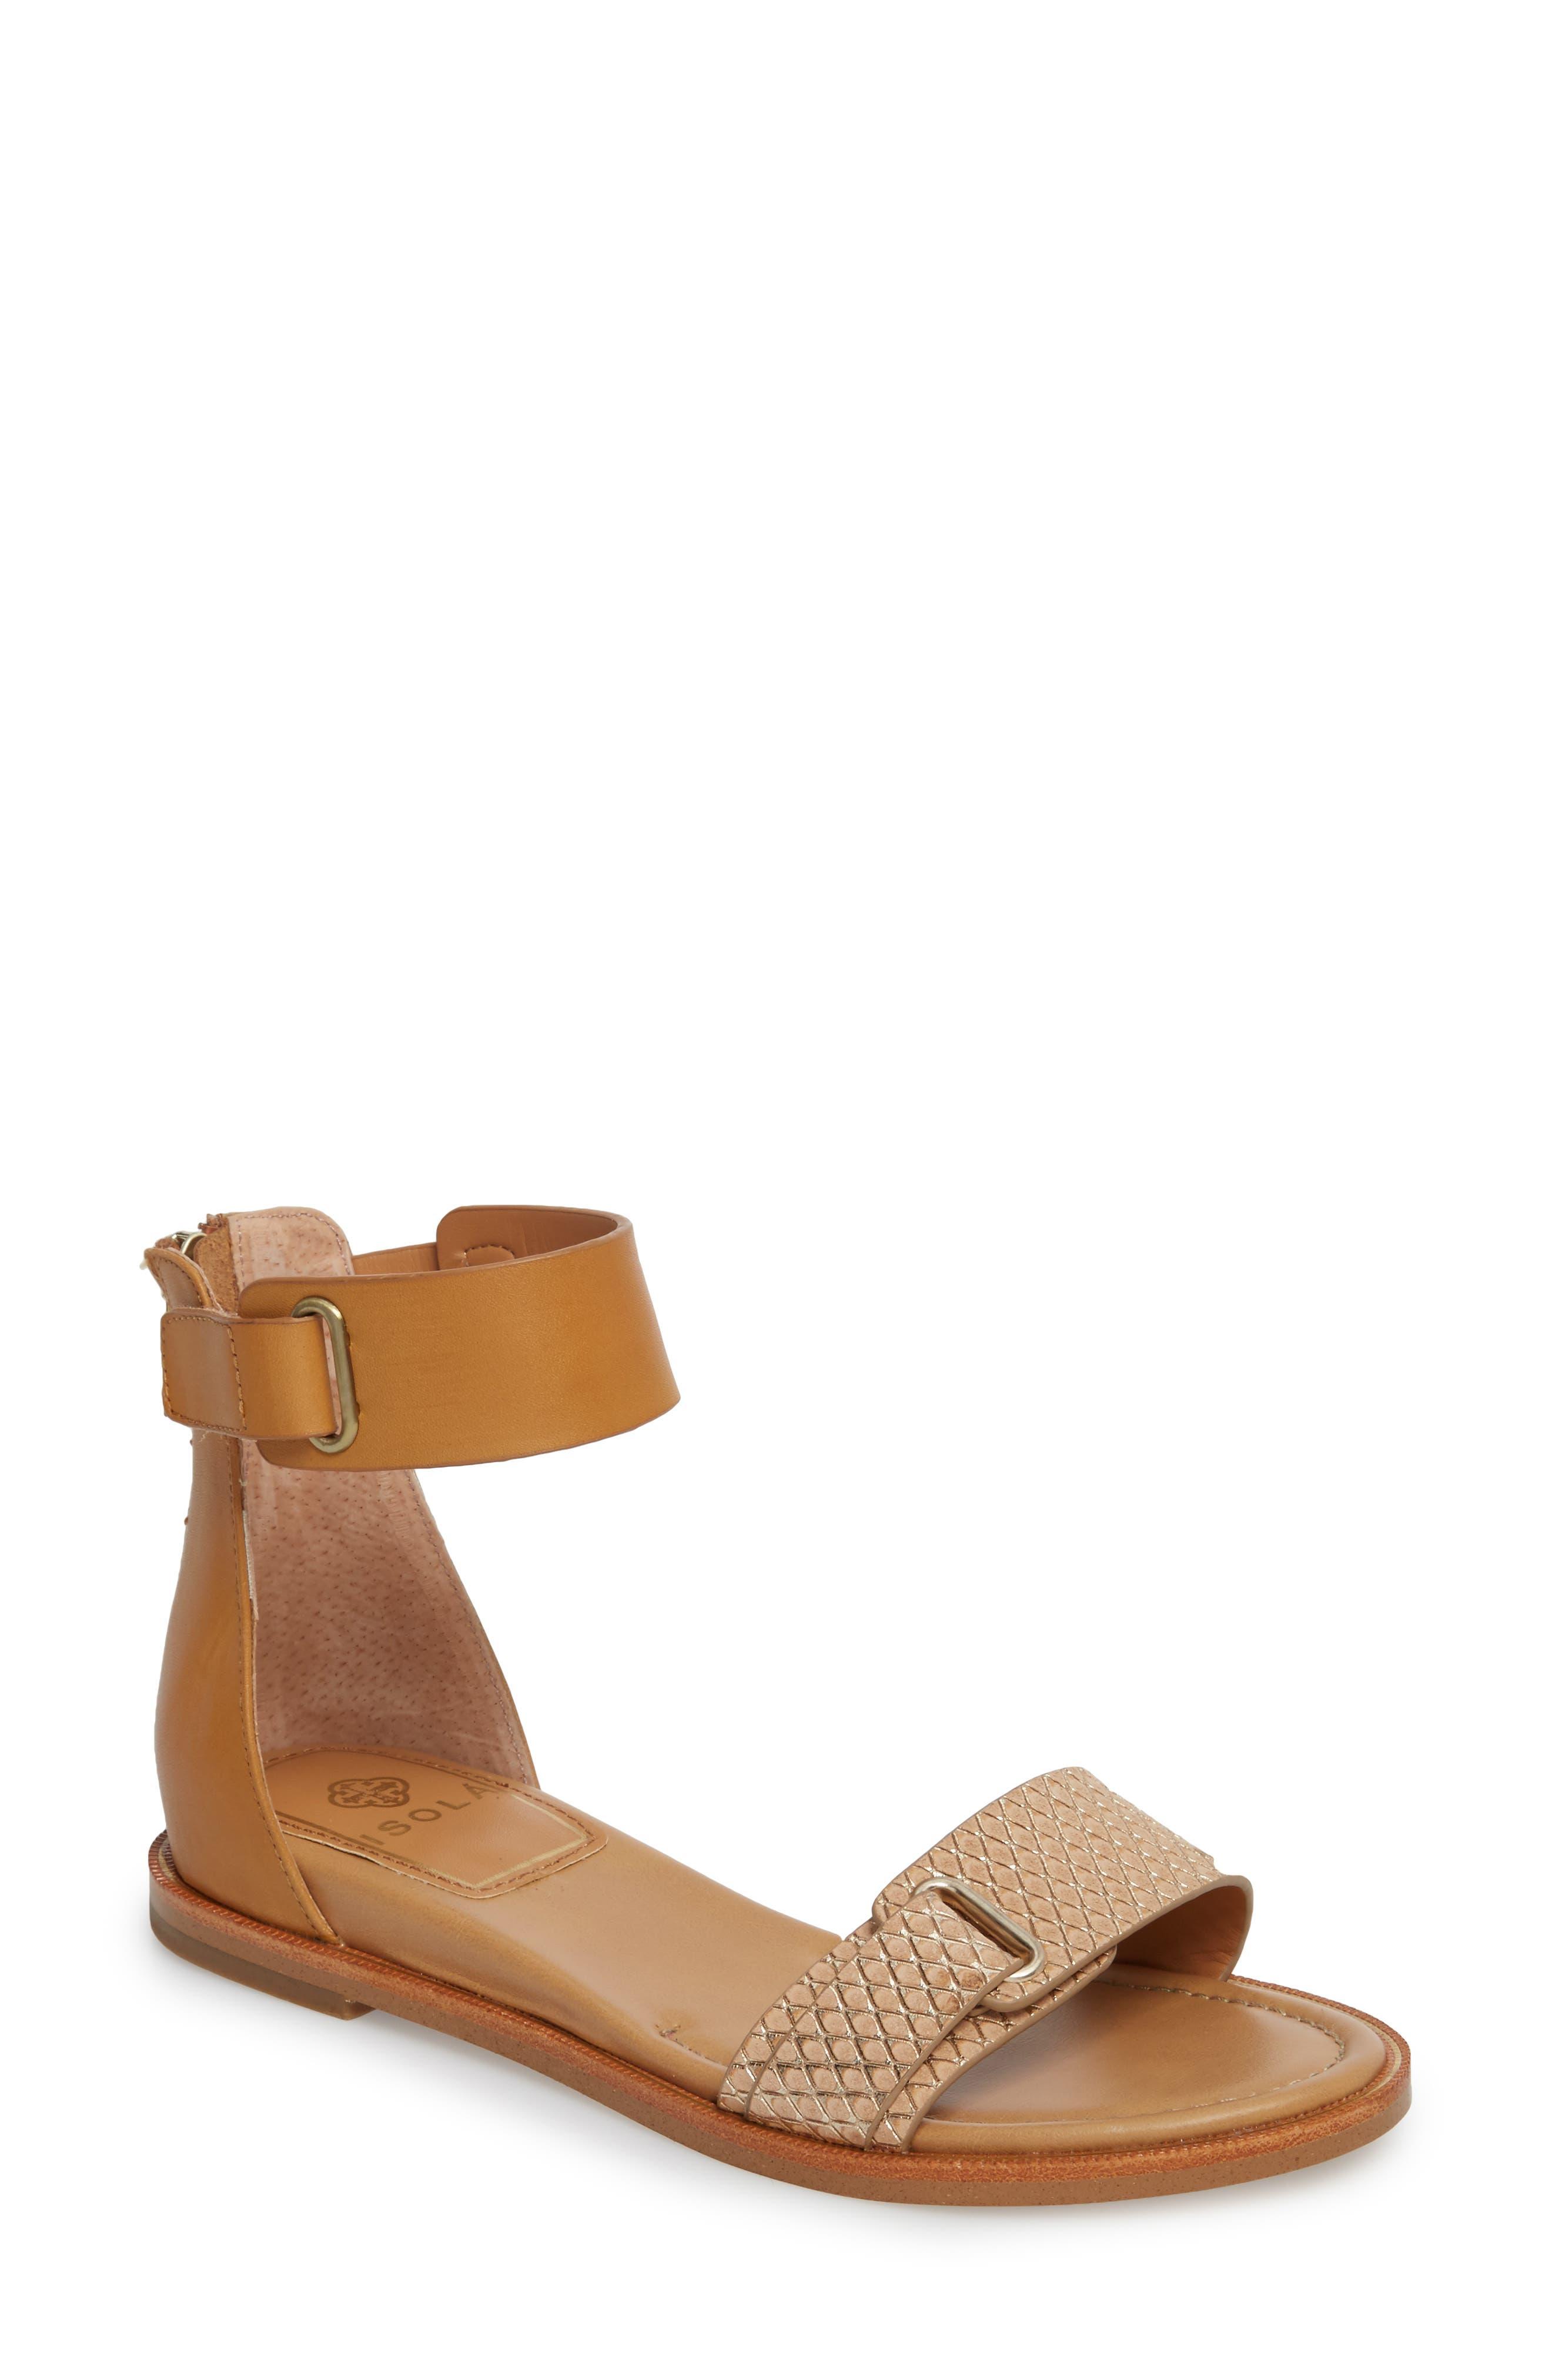 Savina Ankle Strap Sandal,                         Main,                         color, Gold/ Desert Sand Leather